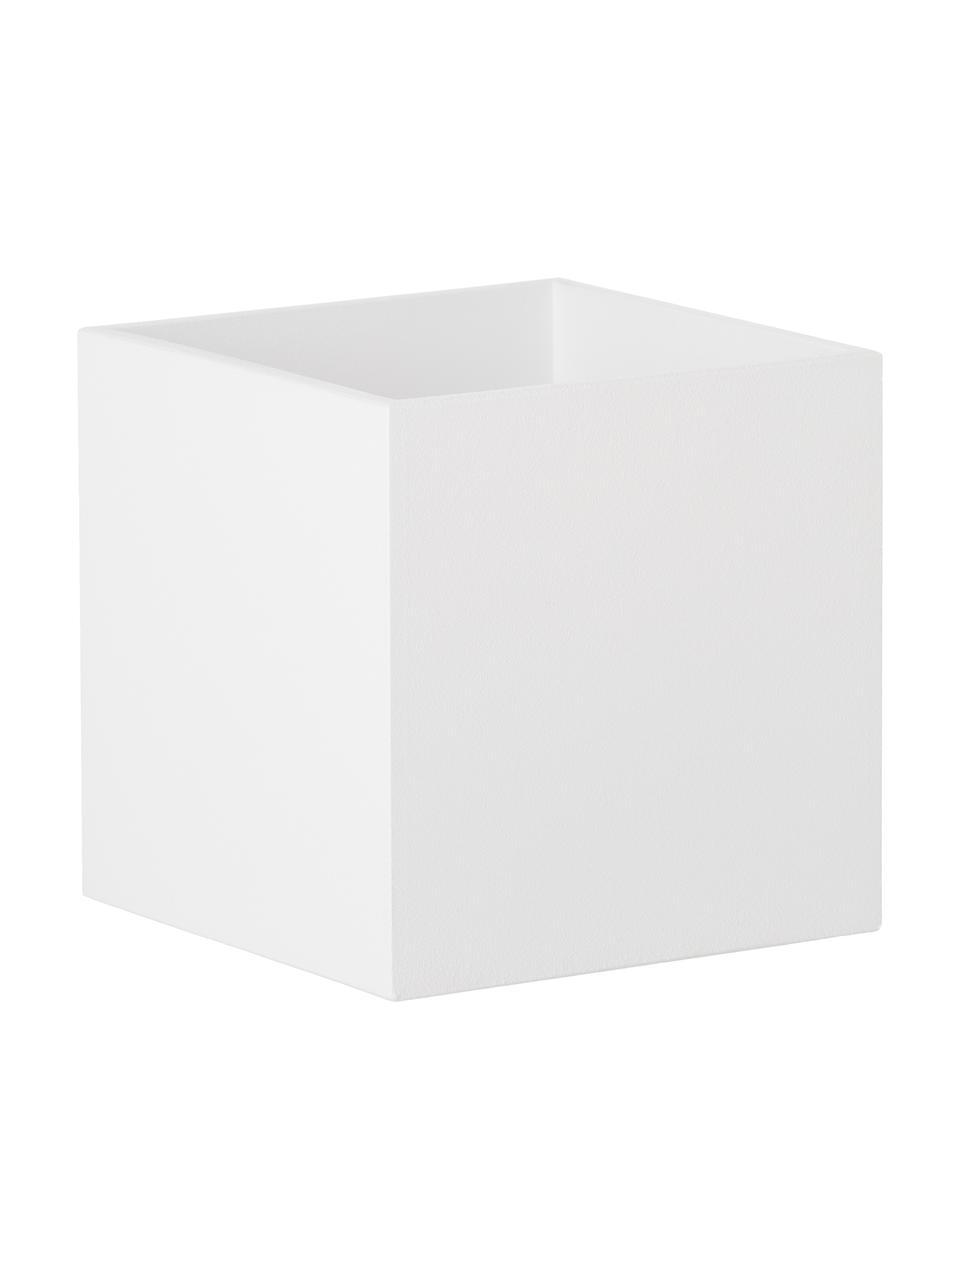 Applique Quad, Alluminio, verniciato a polvere, Bianco, Larg. 10 x Alt. 10 cm